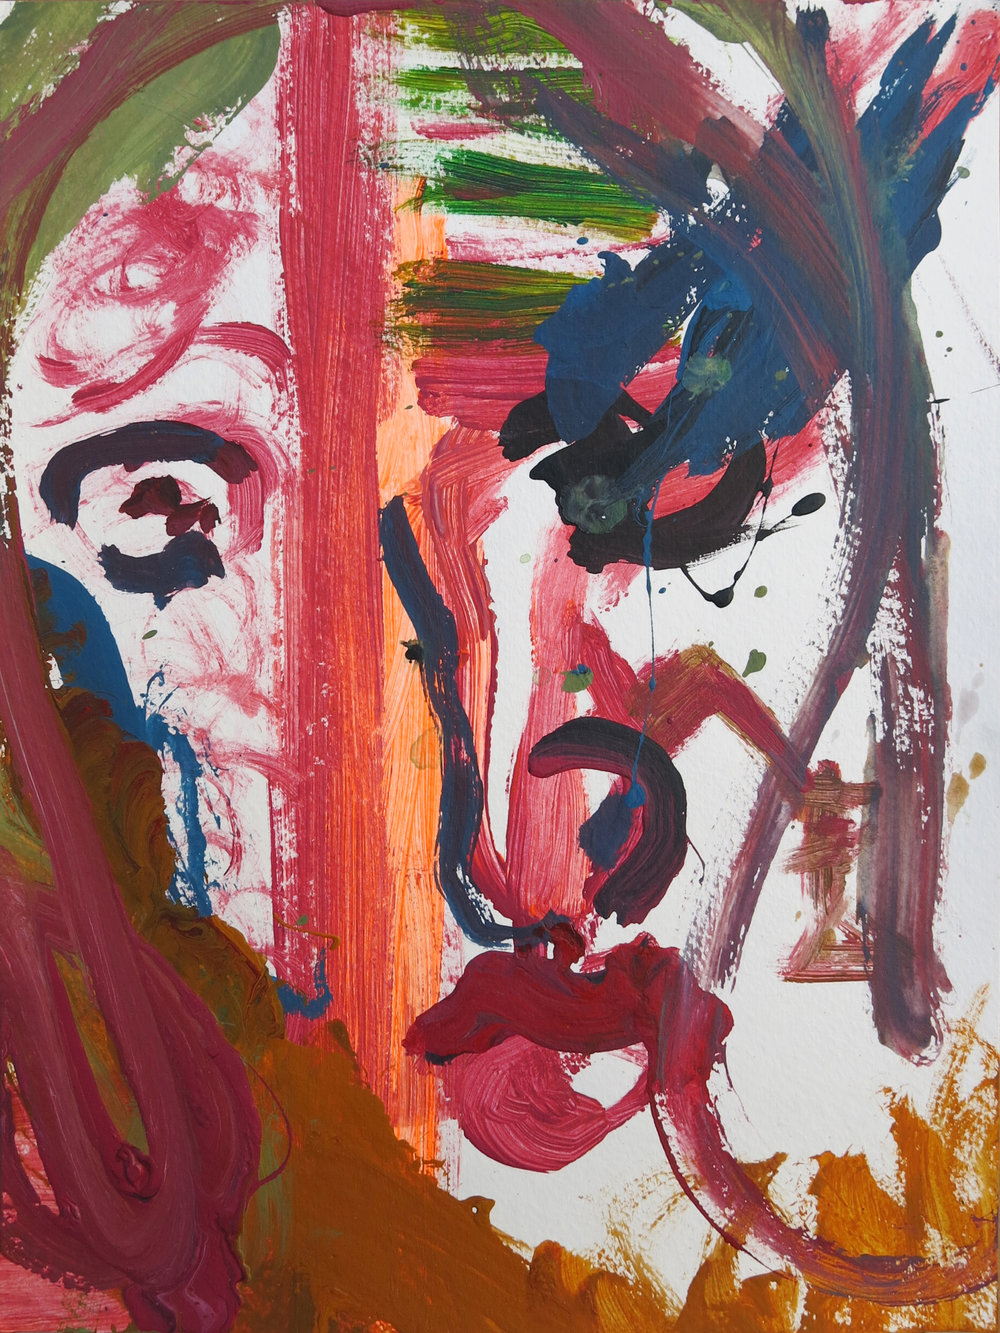 Barbra Streisand Portrait #119